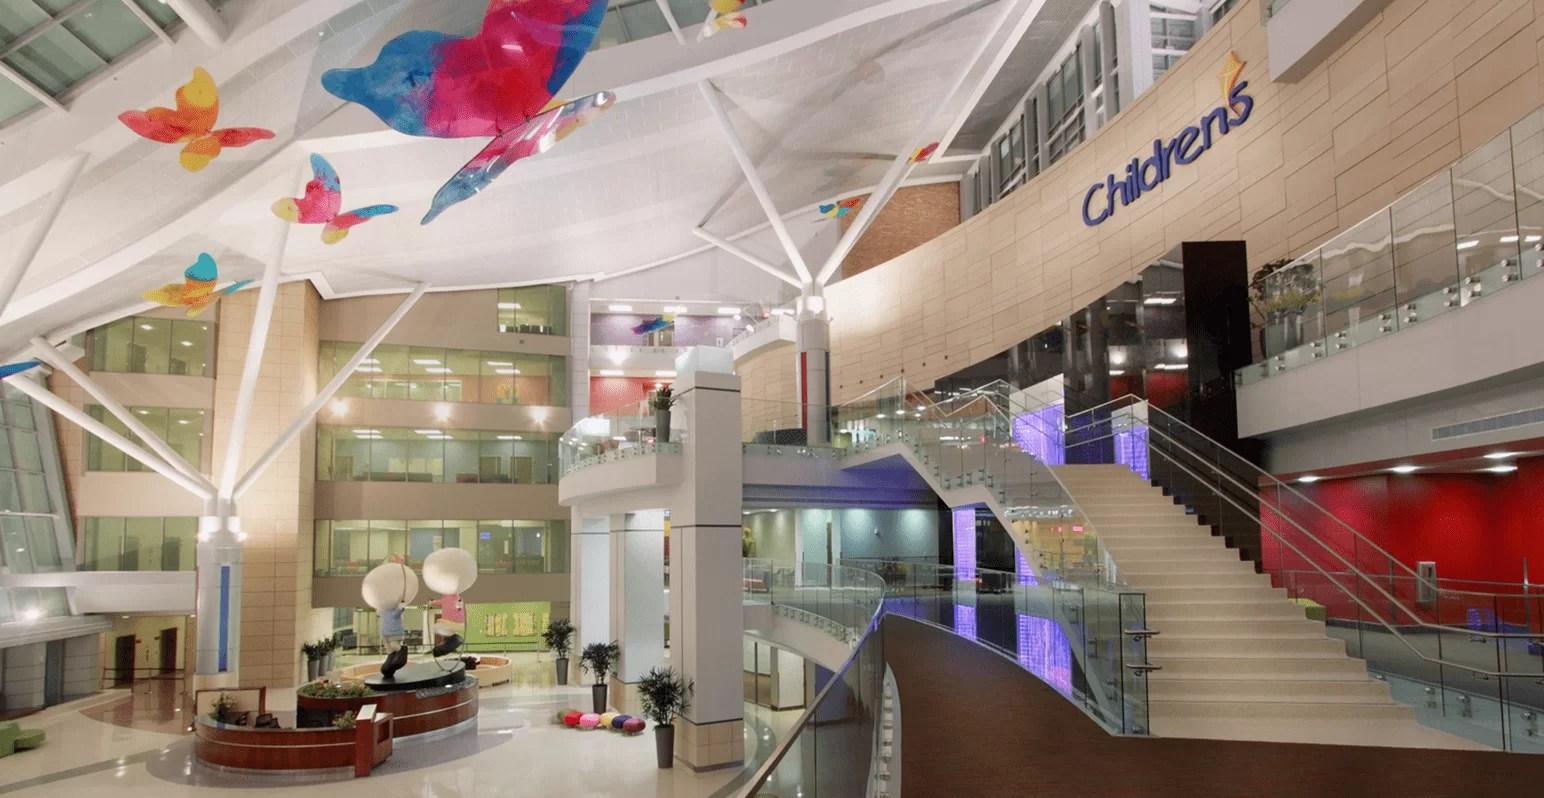 Bubble Wall Vertical Chambers Oklahoma University Children s Hospital